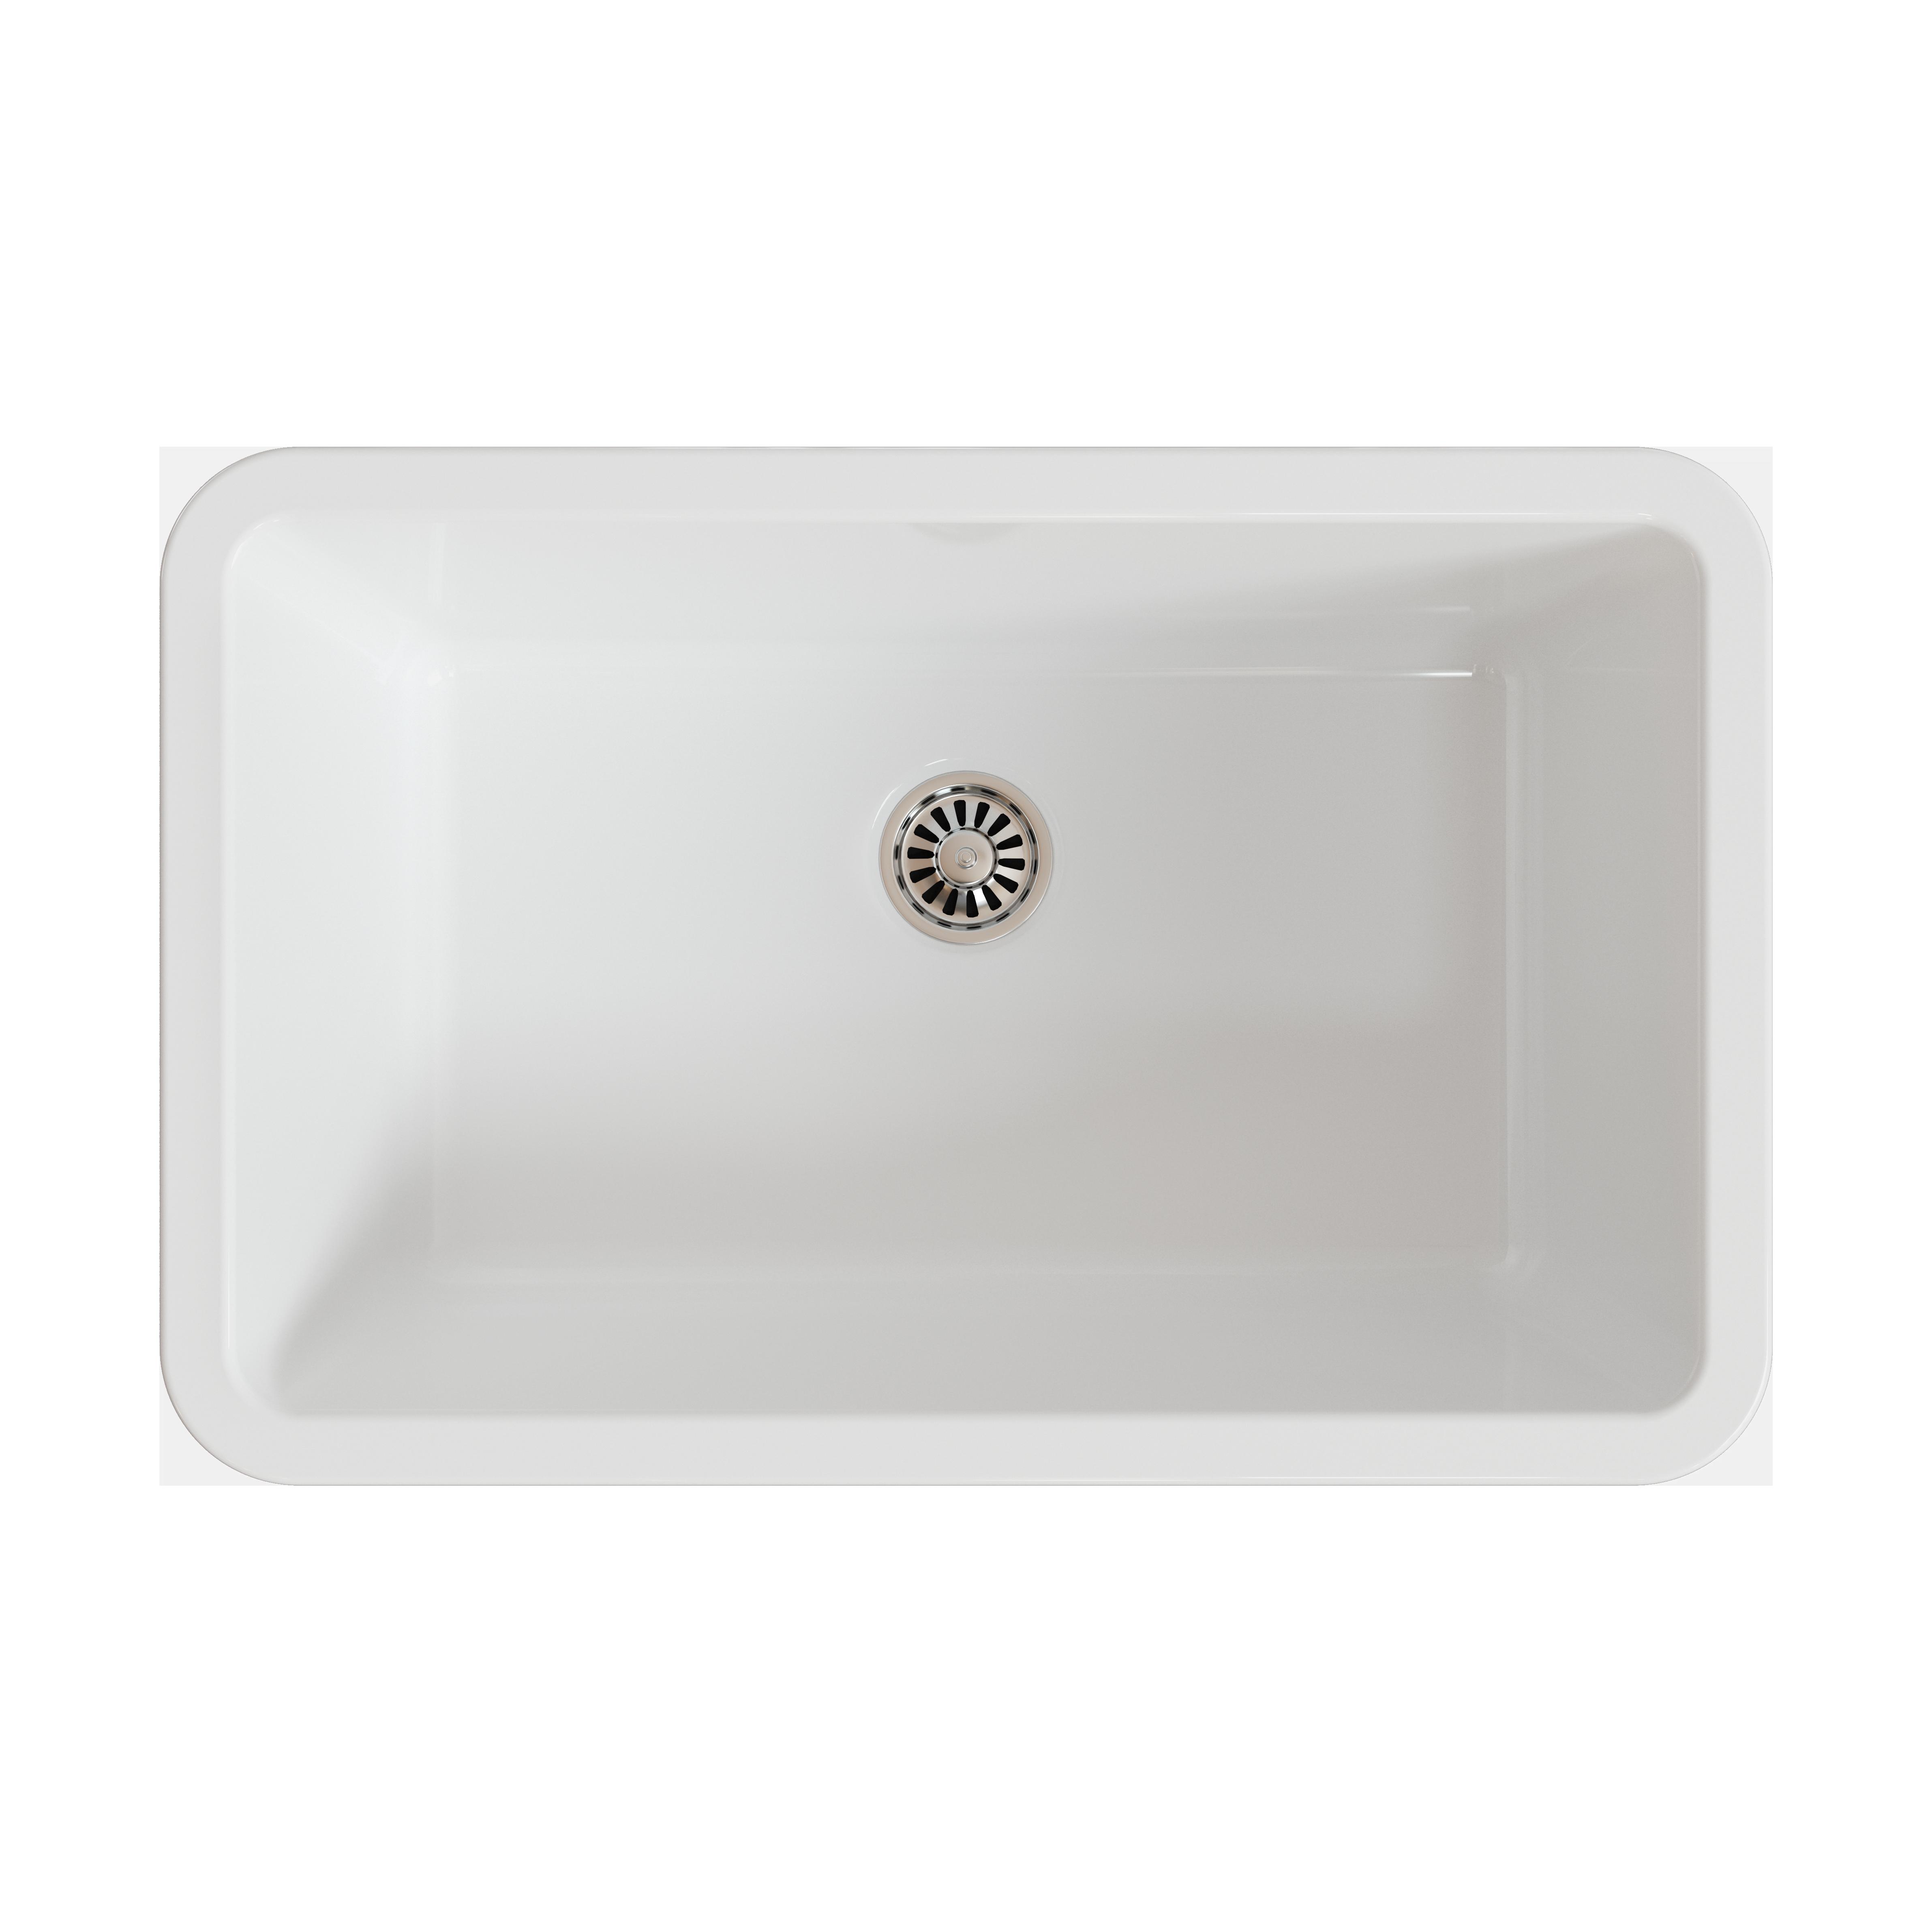 Barclay Ks30 Wh Pierina 29 1 2 Fireclay Sink Qualitybath Com